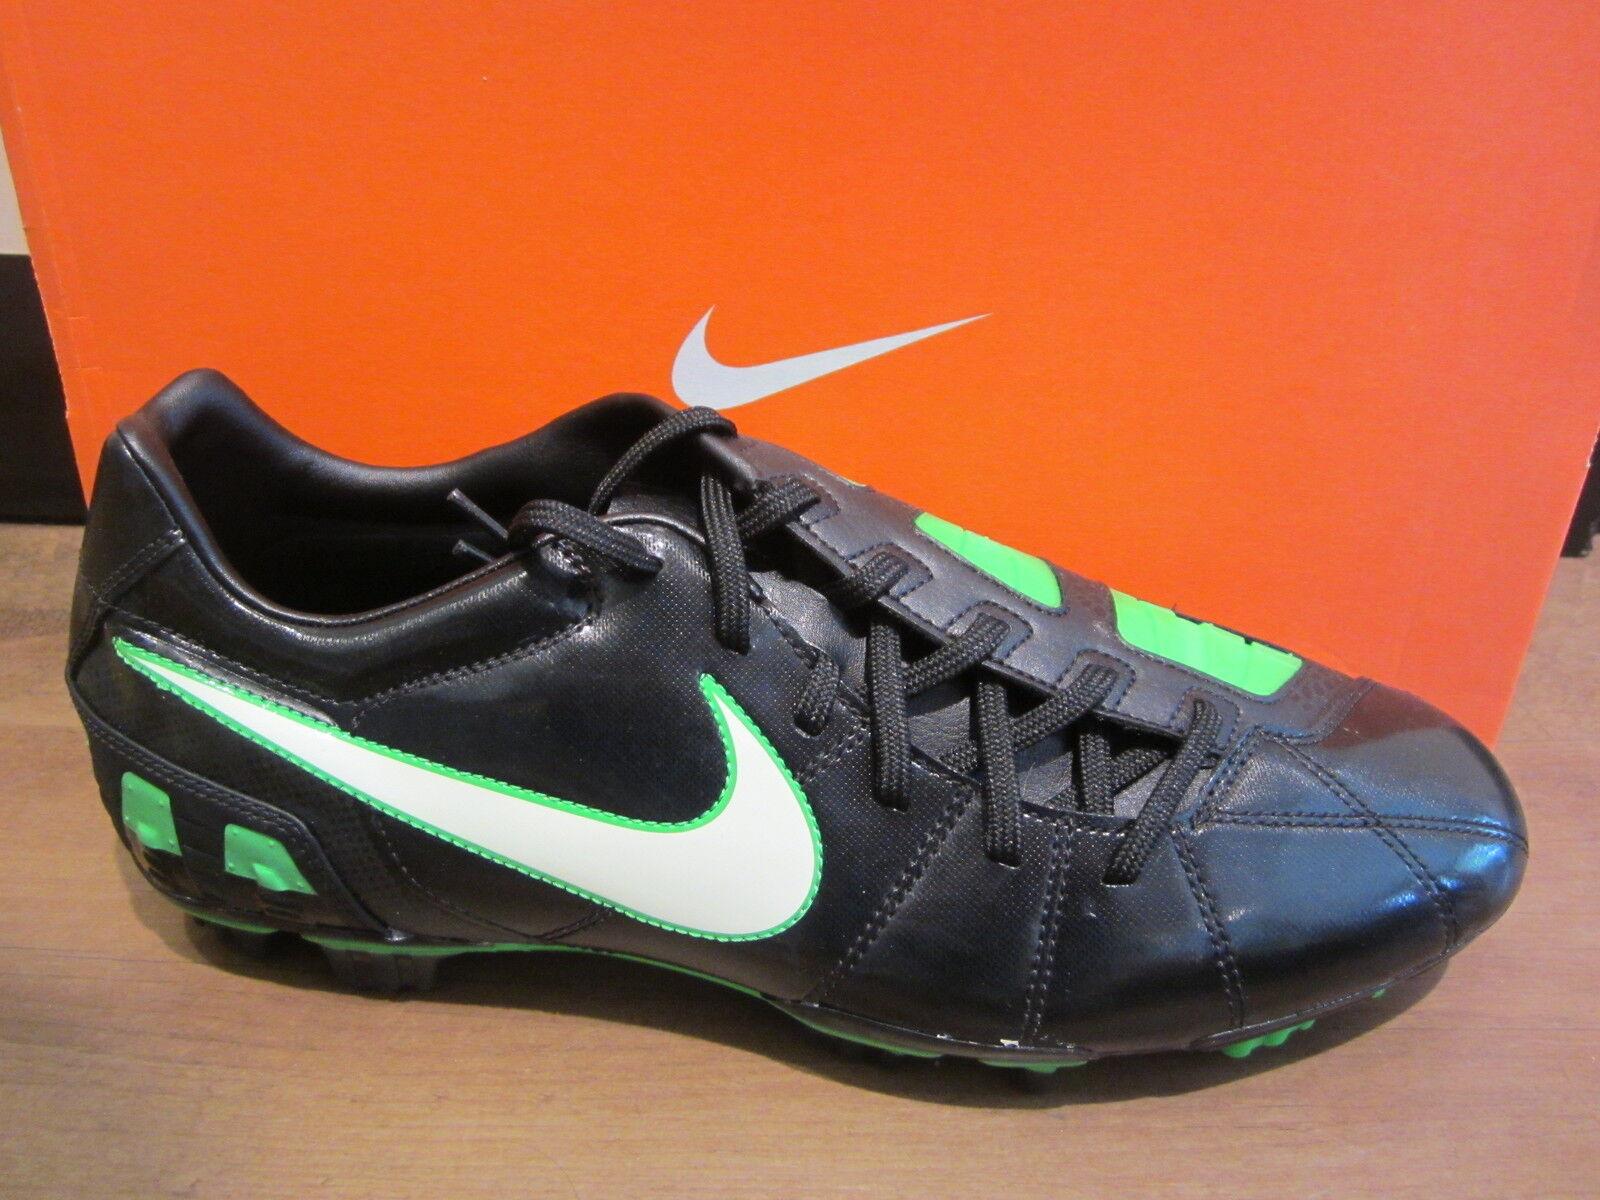 Nike Fußballschuh schwarz grün grün grün Nockenstollen NEU 398c3b